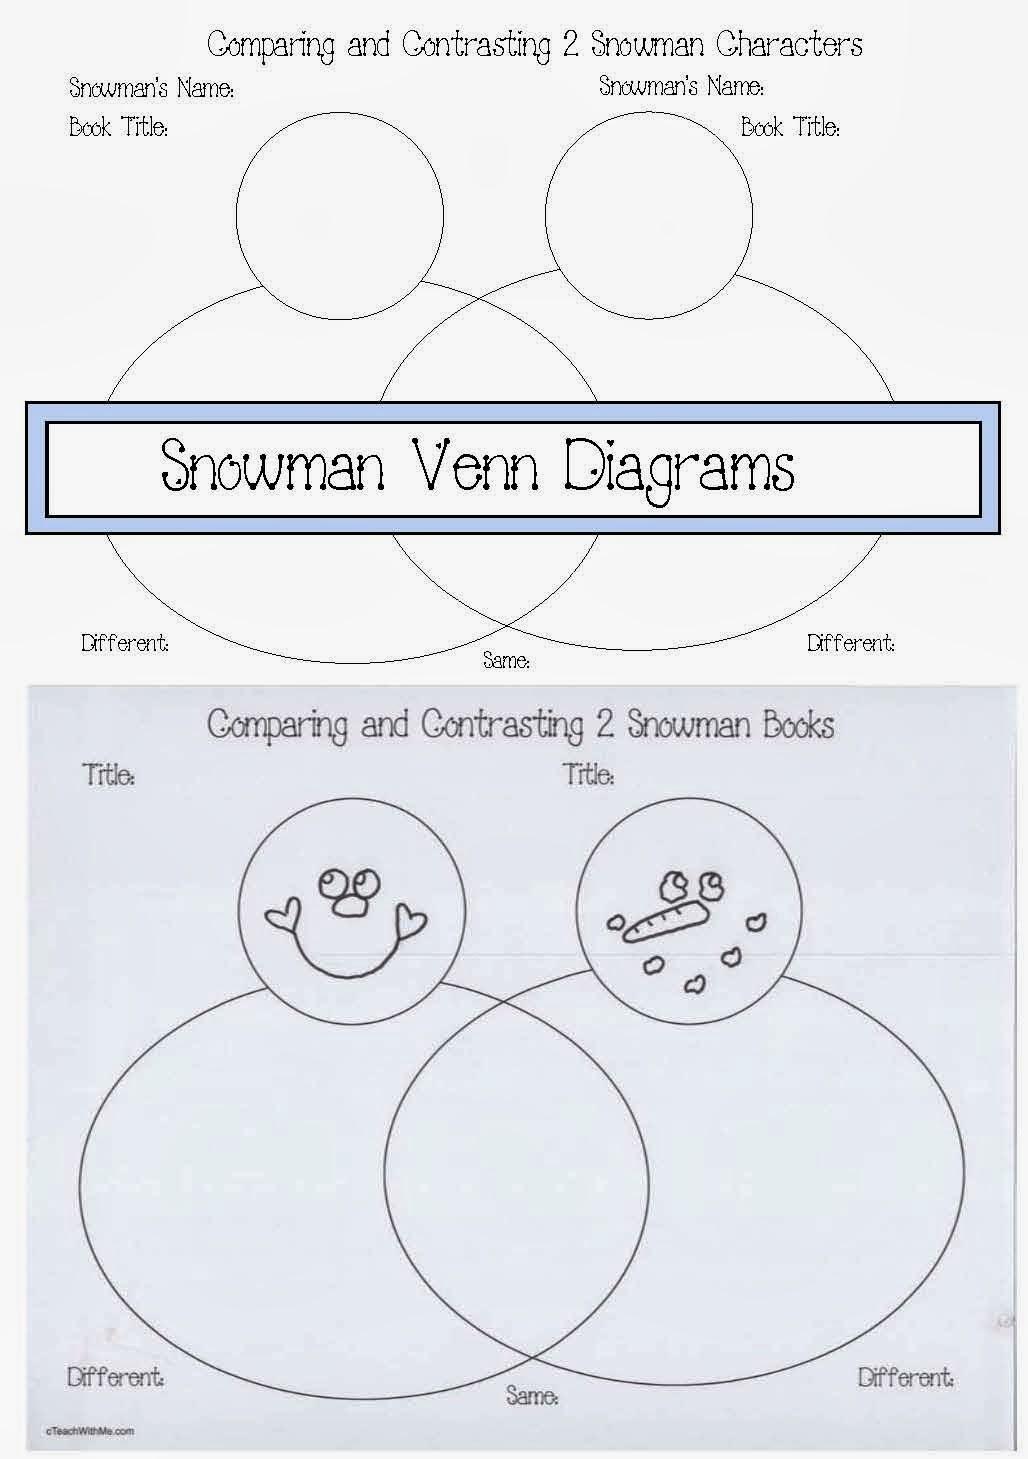 Snowman Venn Diagrams | Christmas school, Christmas ... |Snowmen Venn Diagram